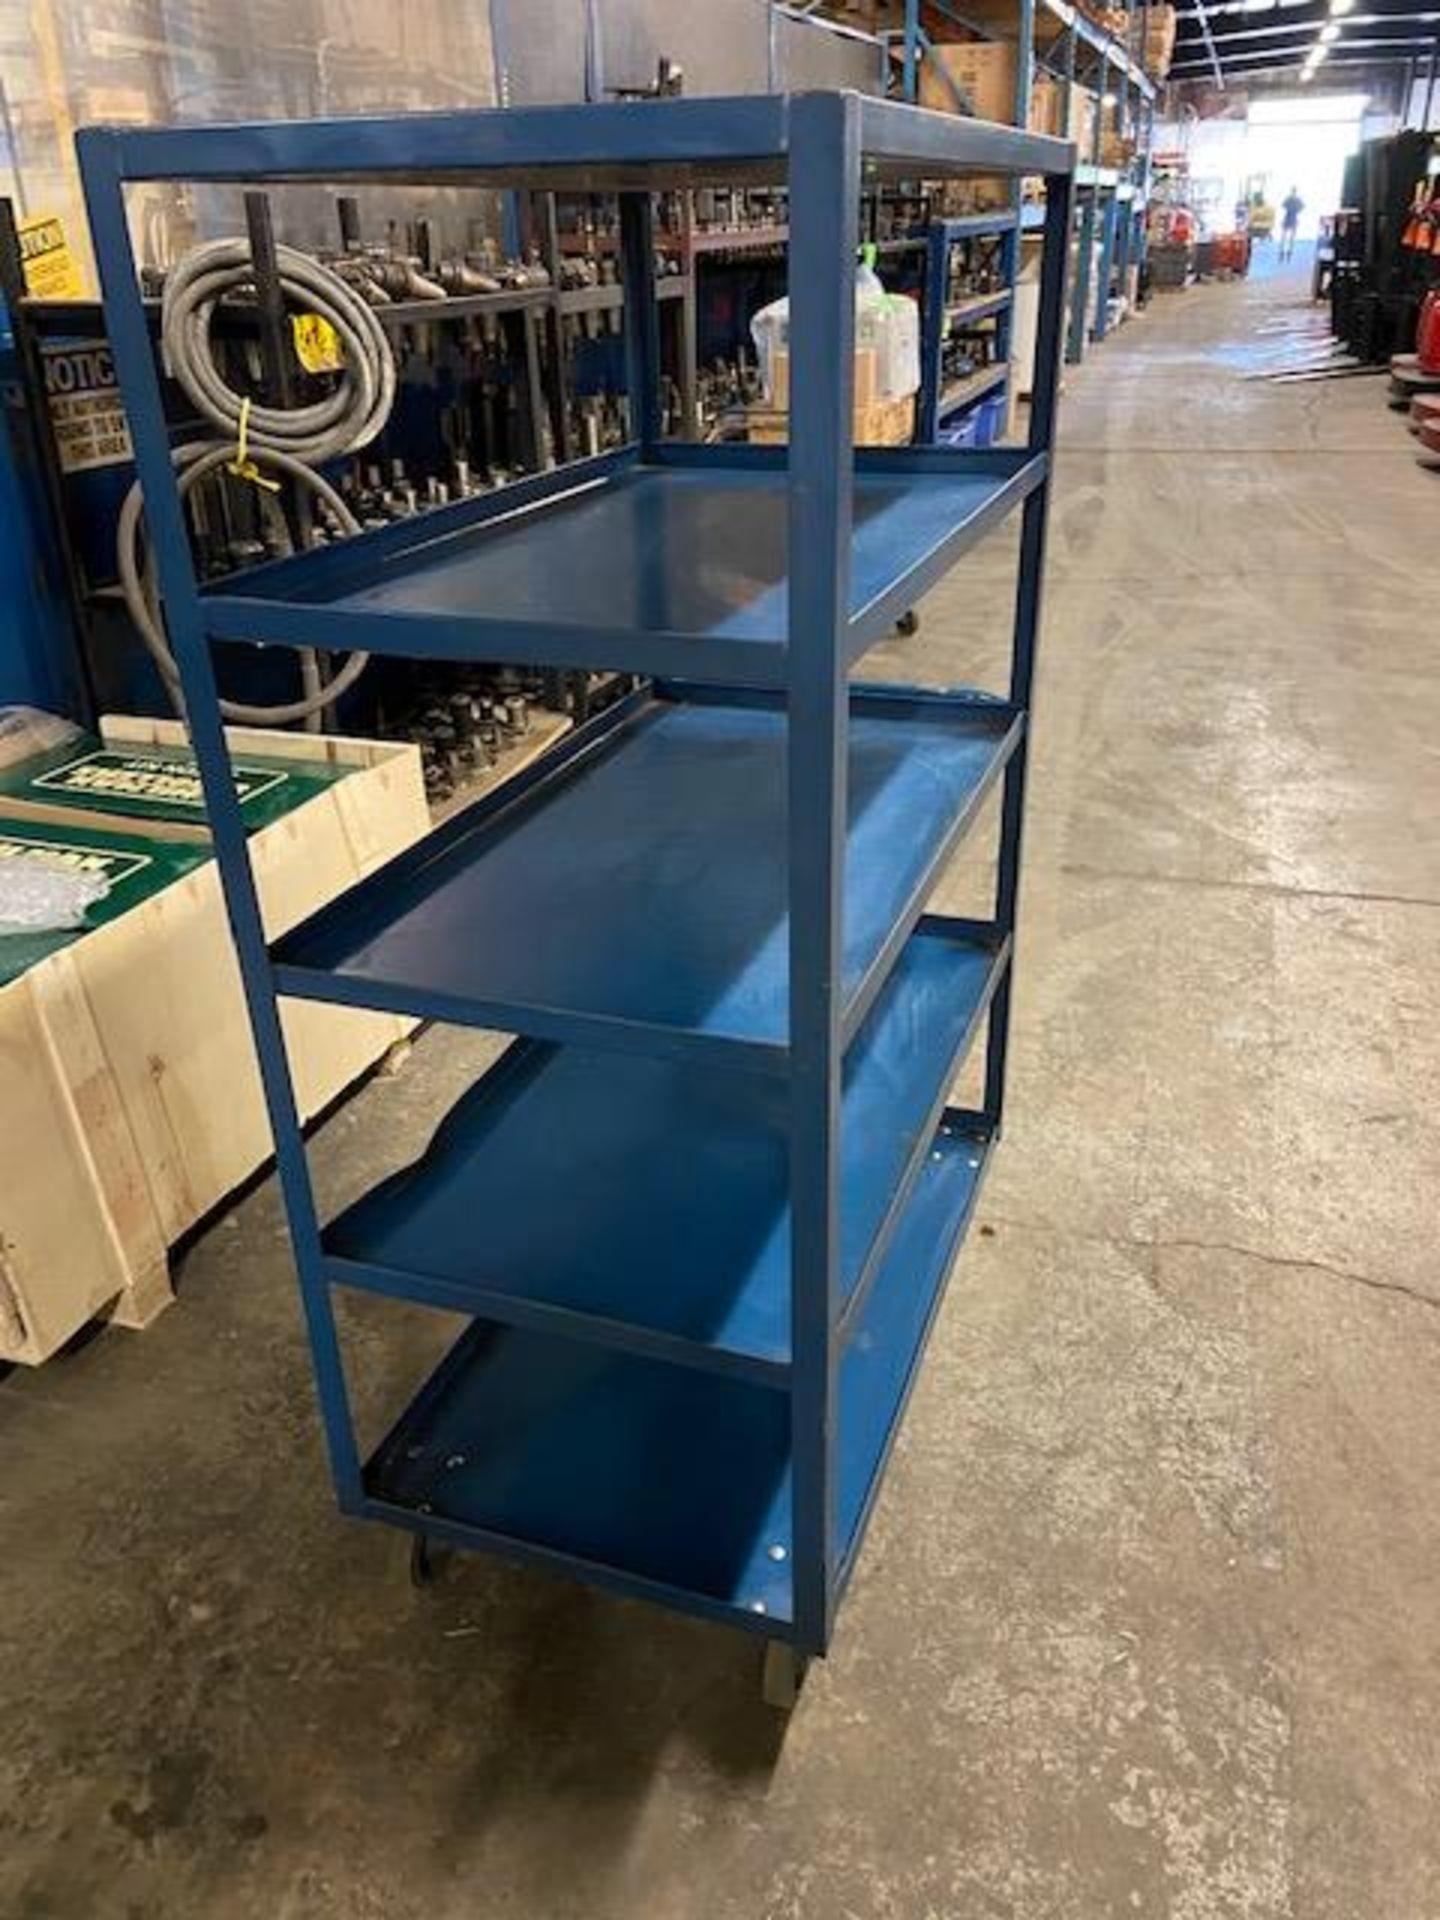 Rolling Cart - 5 Tier Shelves - Image 2 of 2